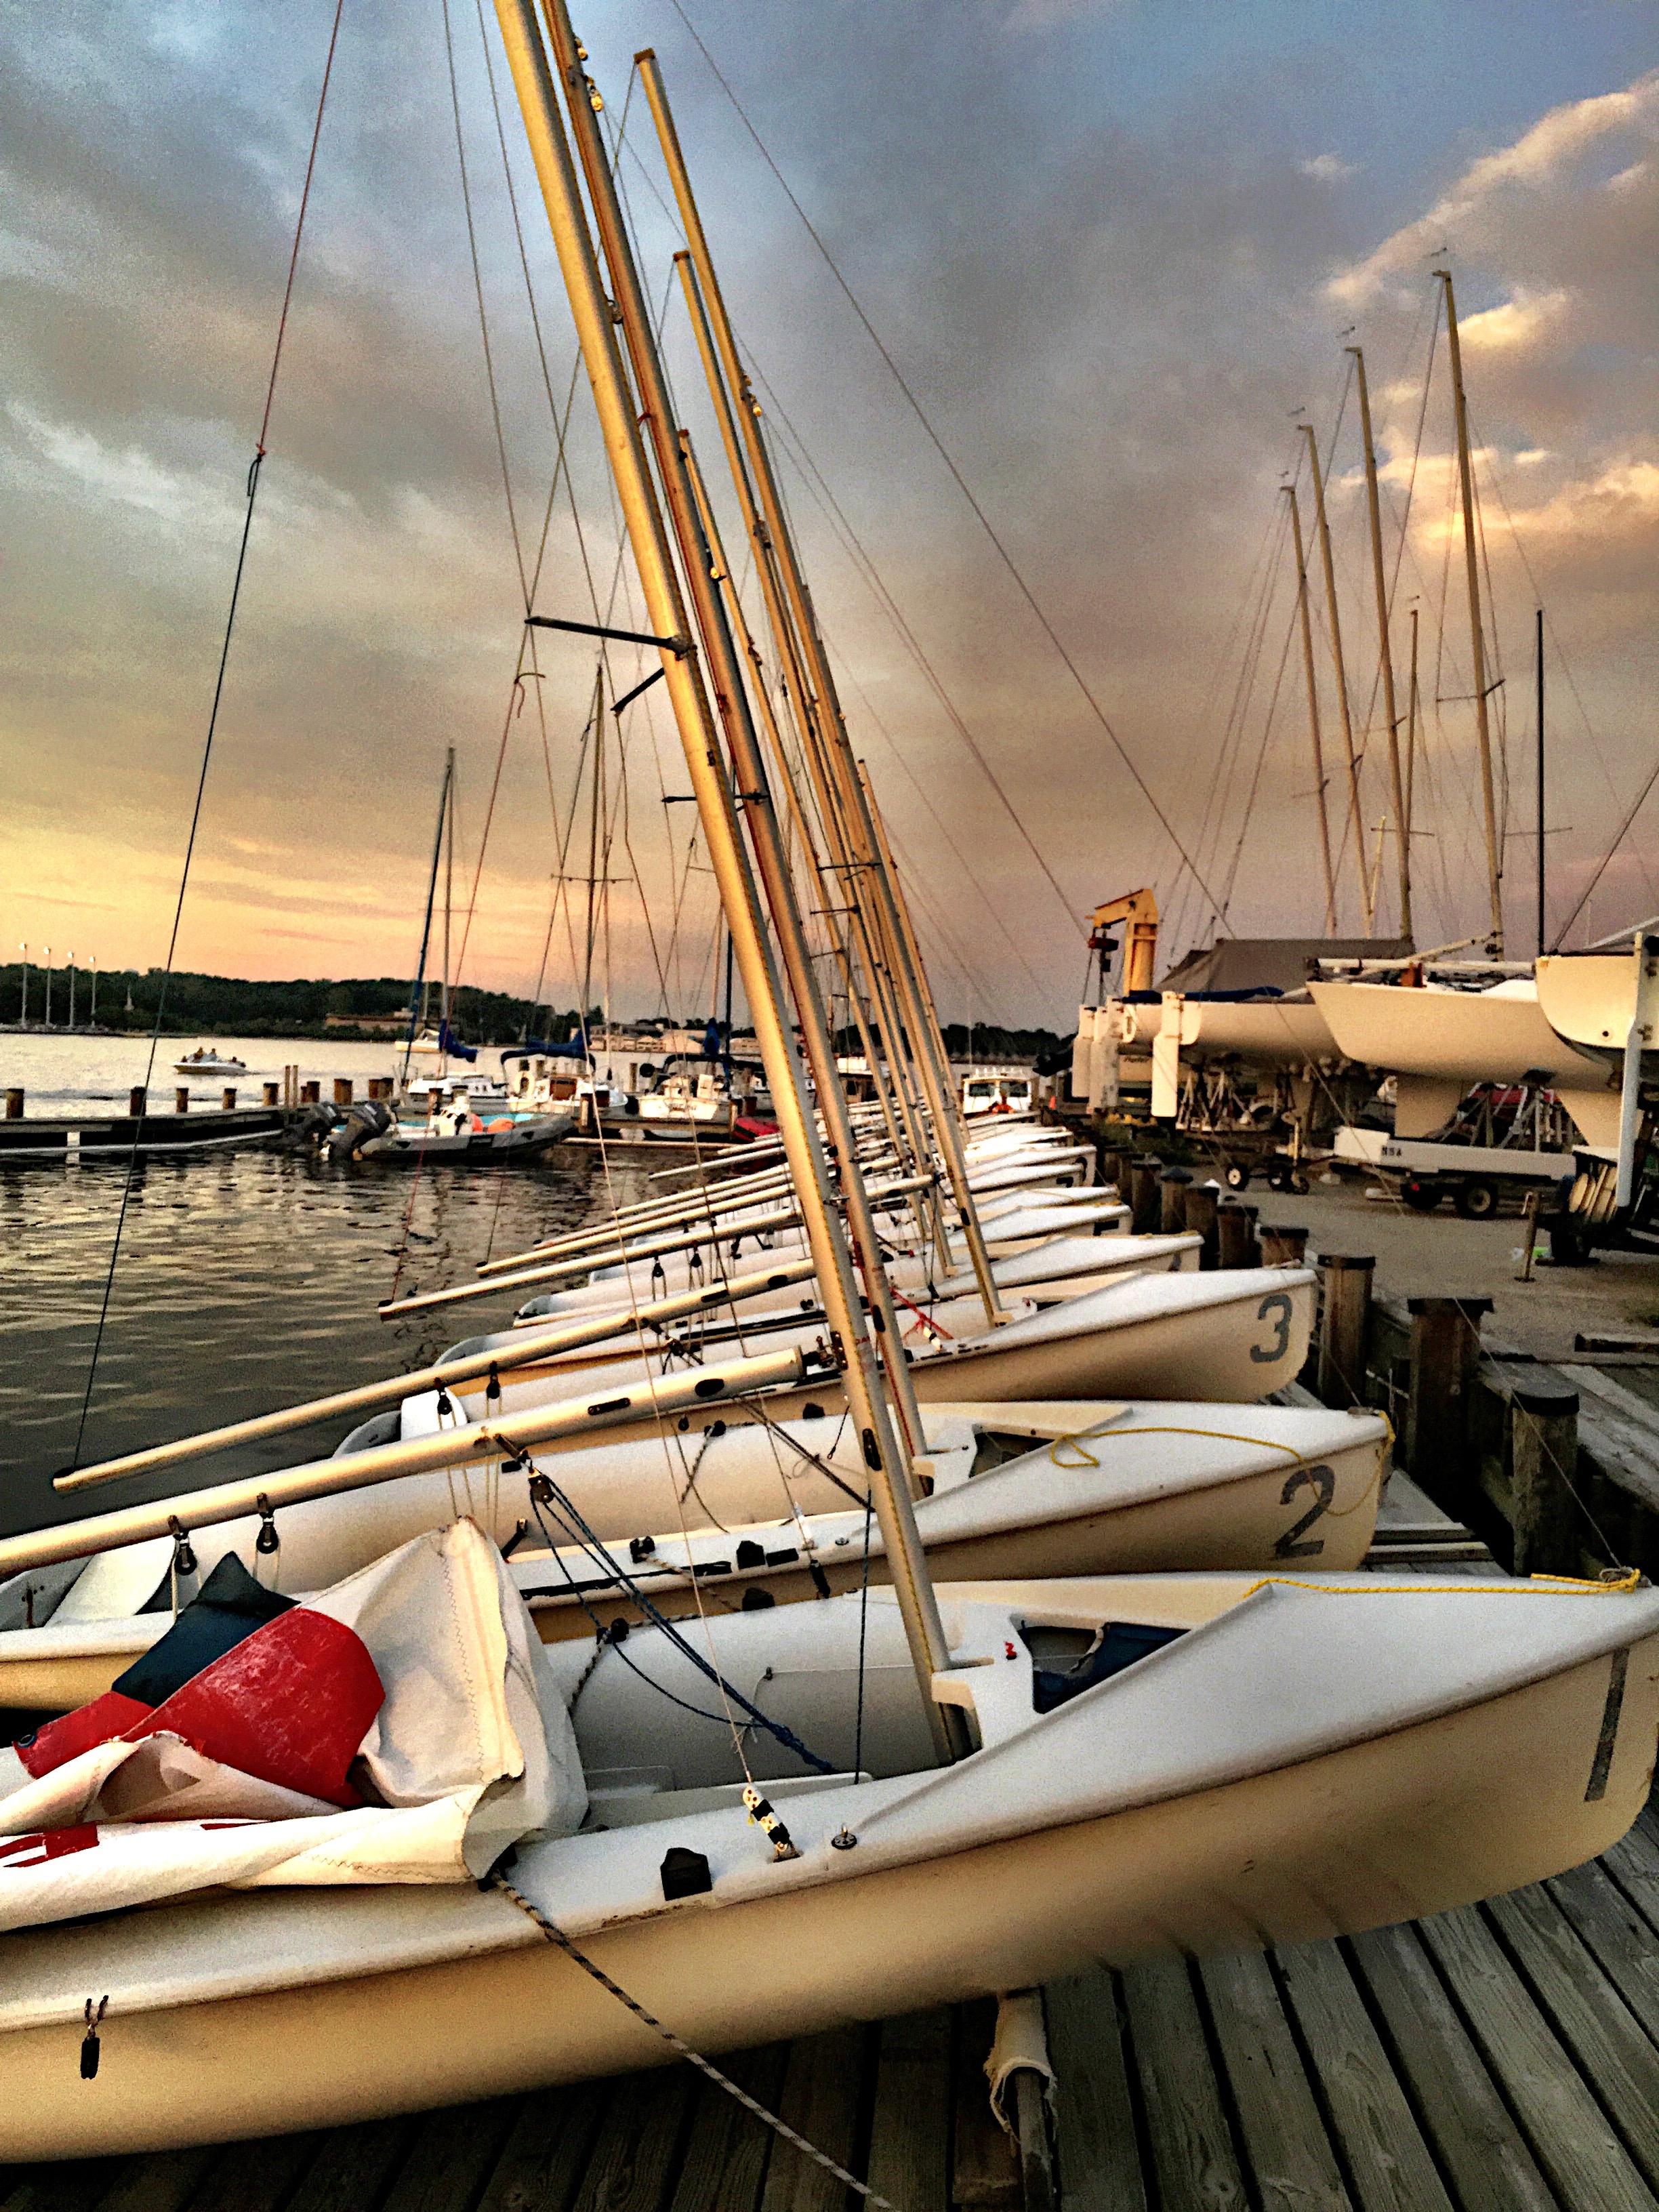 Ready to Sail, SSA, Annapolis, MD, 2018, 18 x 21, $400